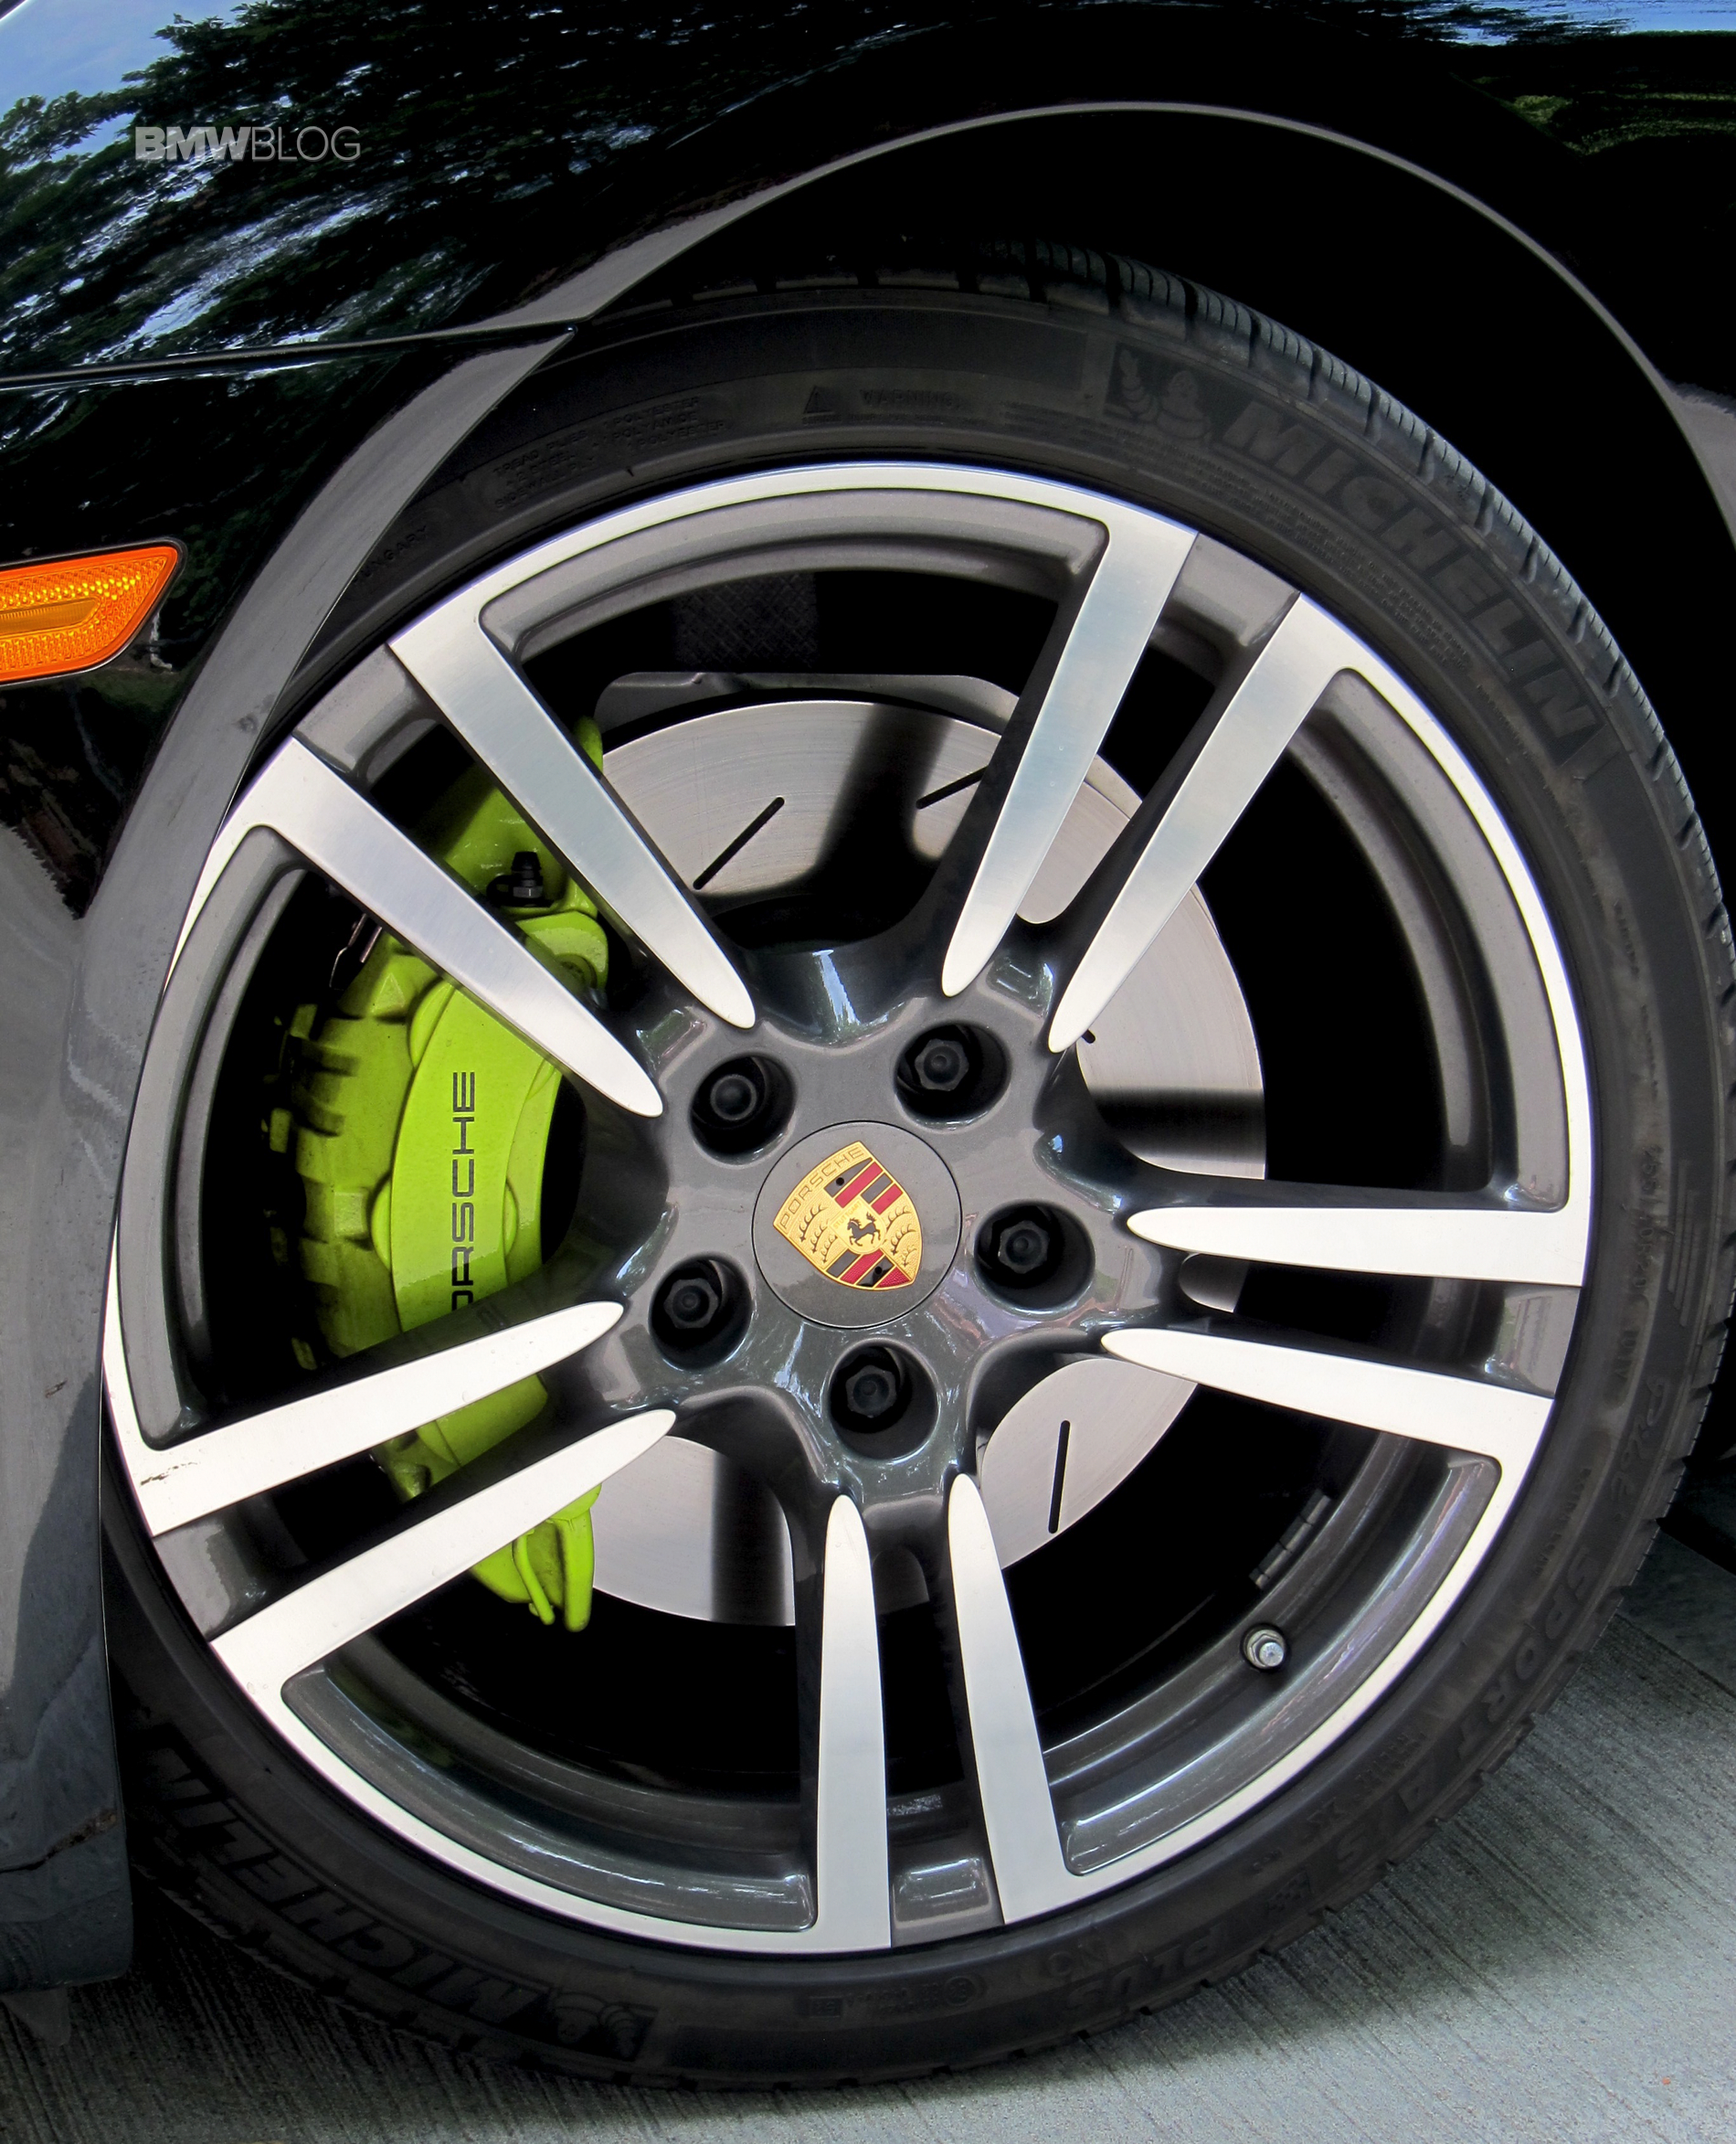 BMWBLOG Test Drive: 2014 Porsche Panamera S E-Hybrid